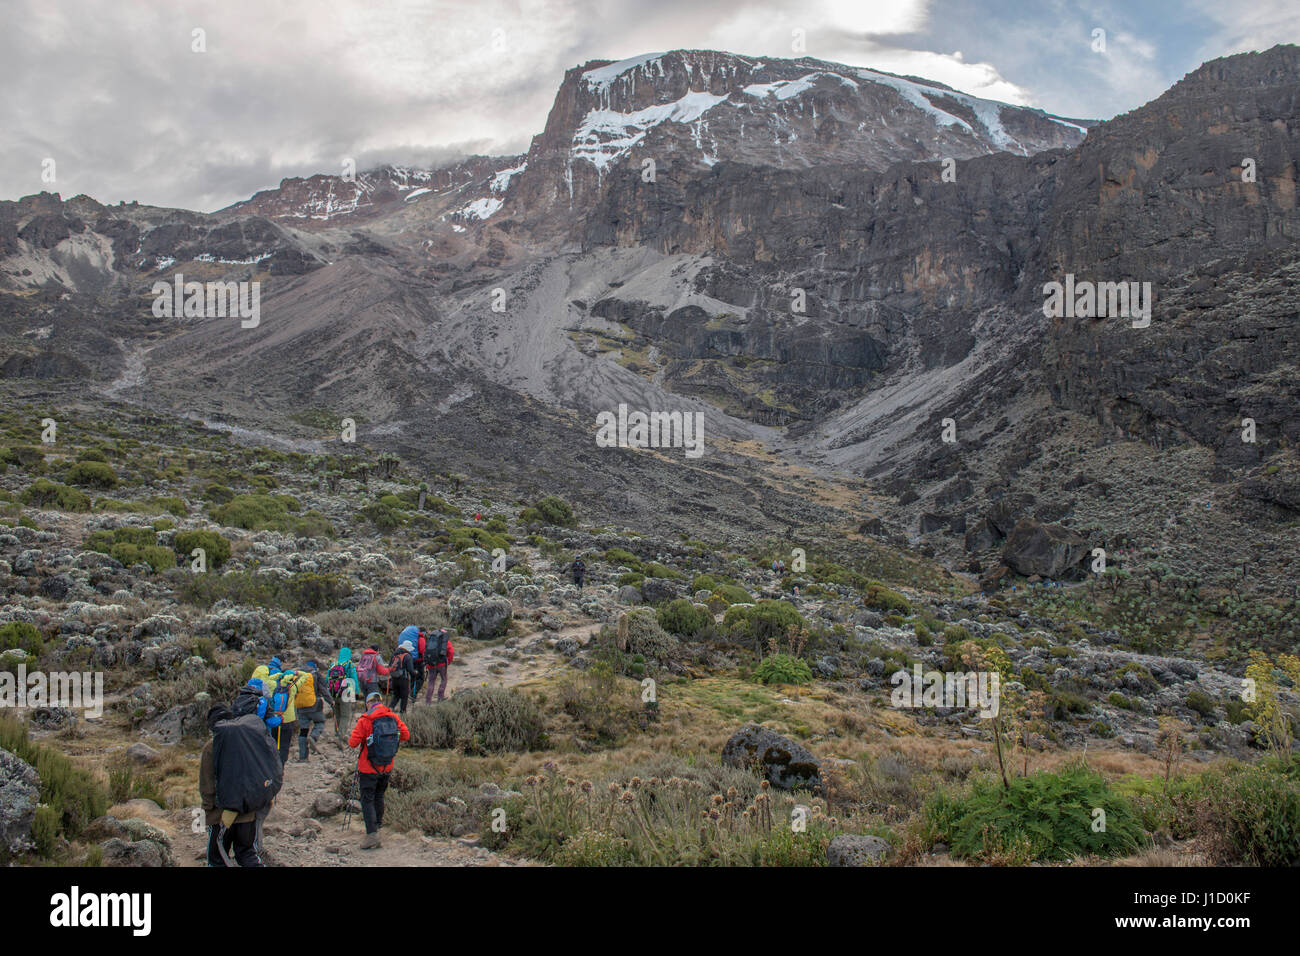 Kilimanjaro scenery - Stock Image